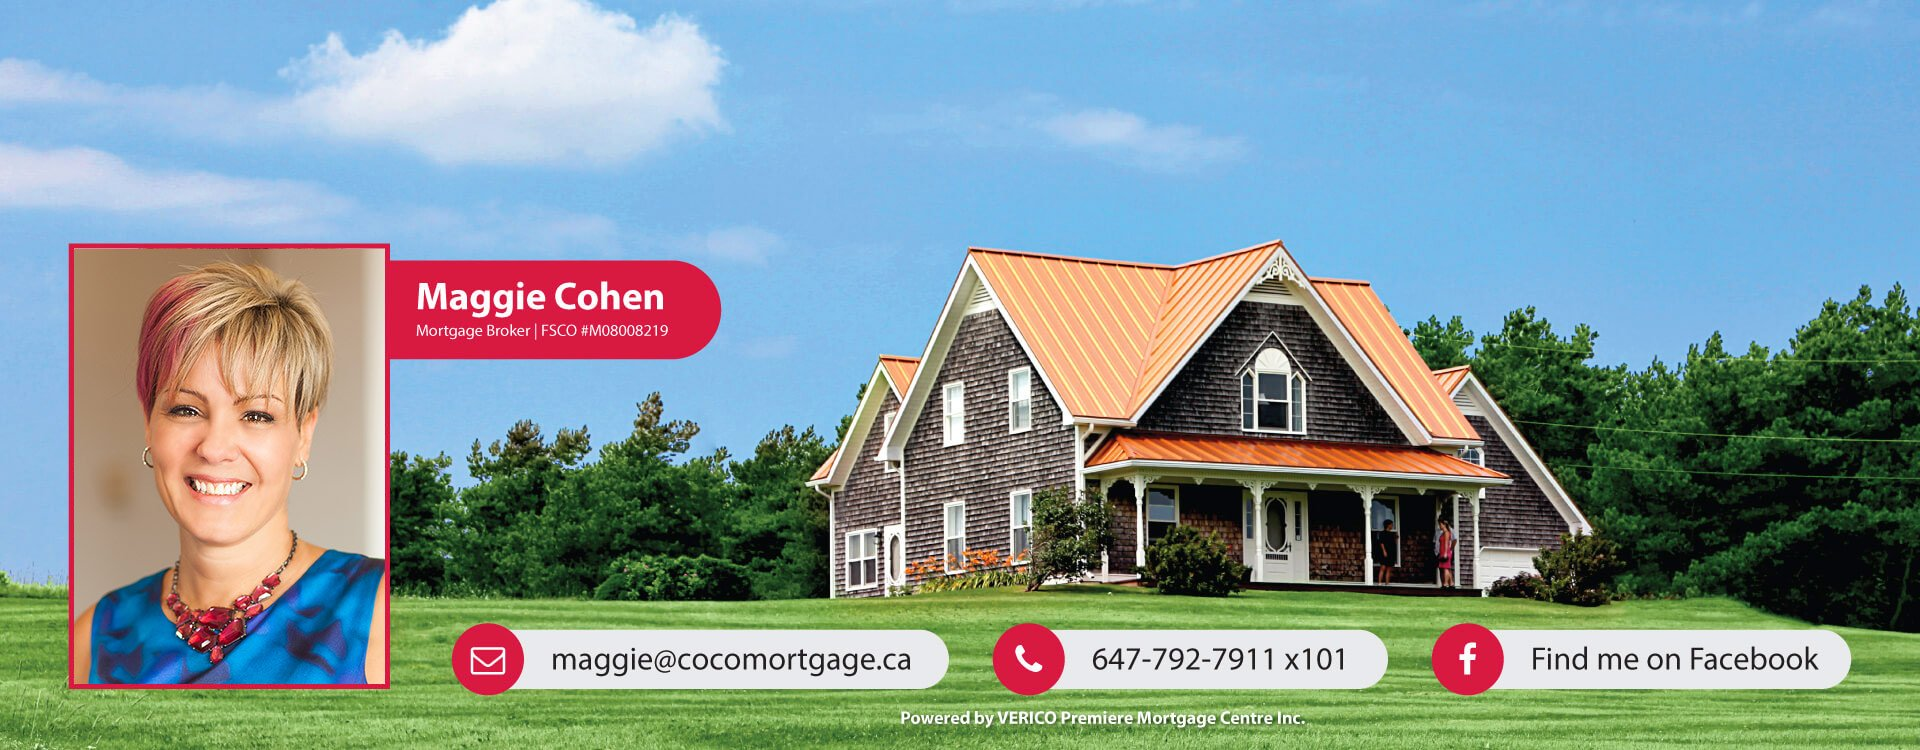 CoCo Mortgage Contact Info